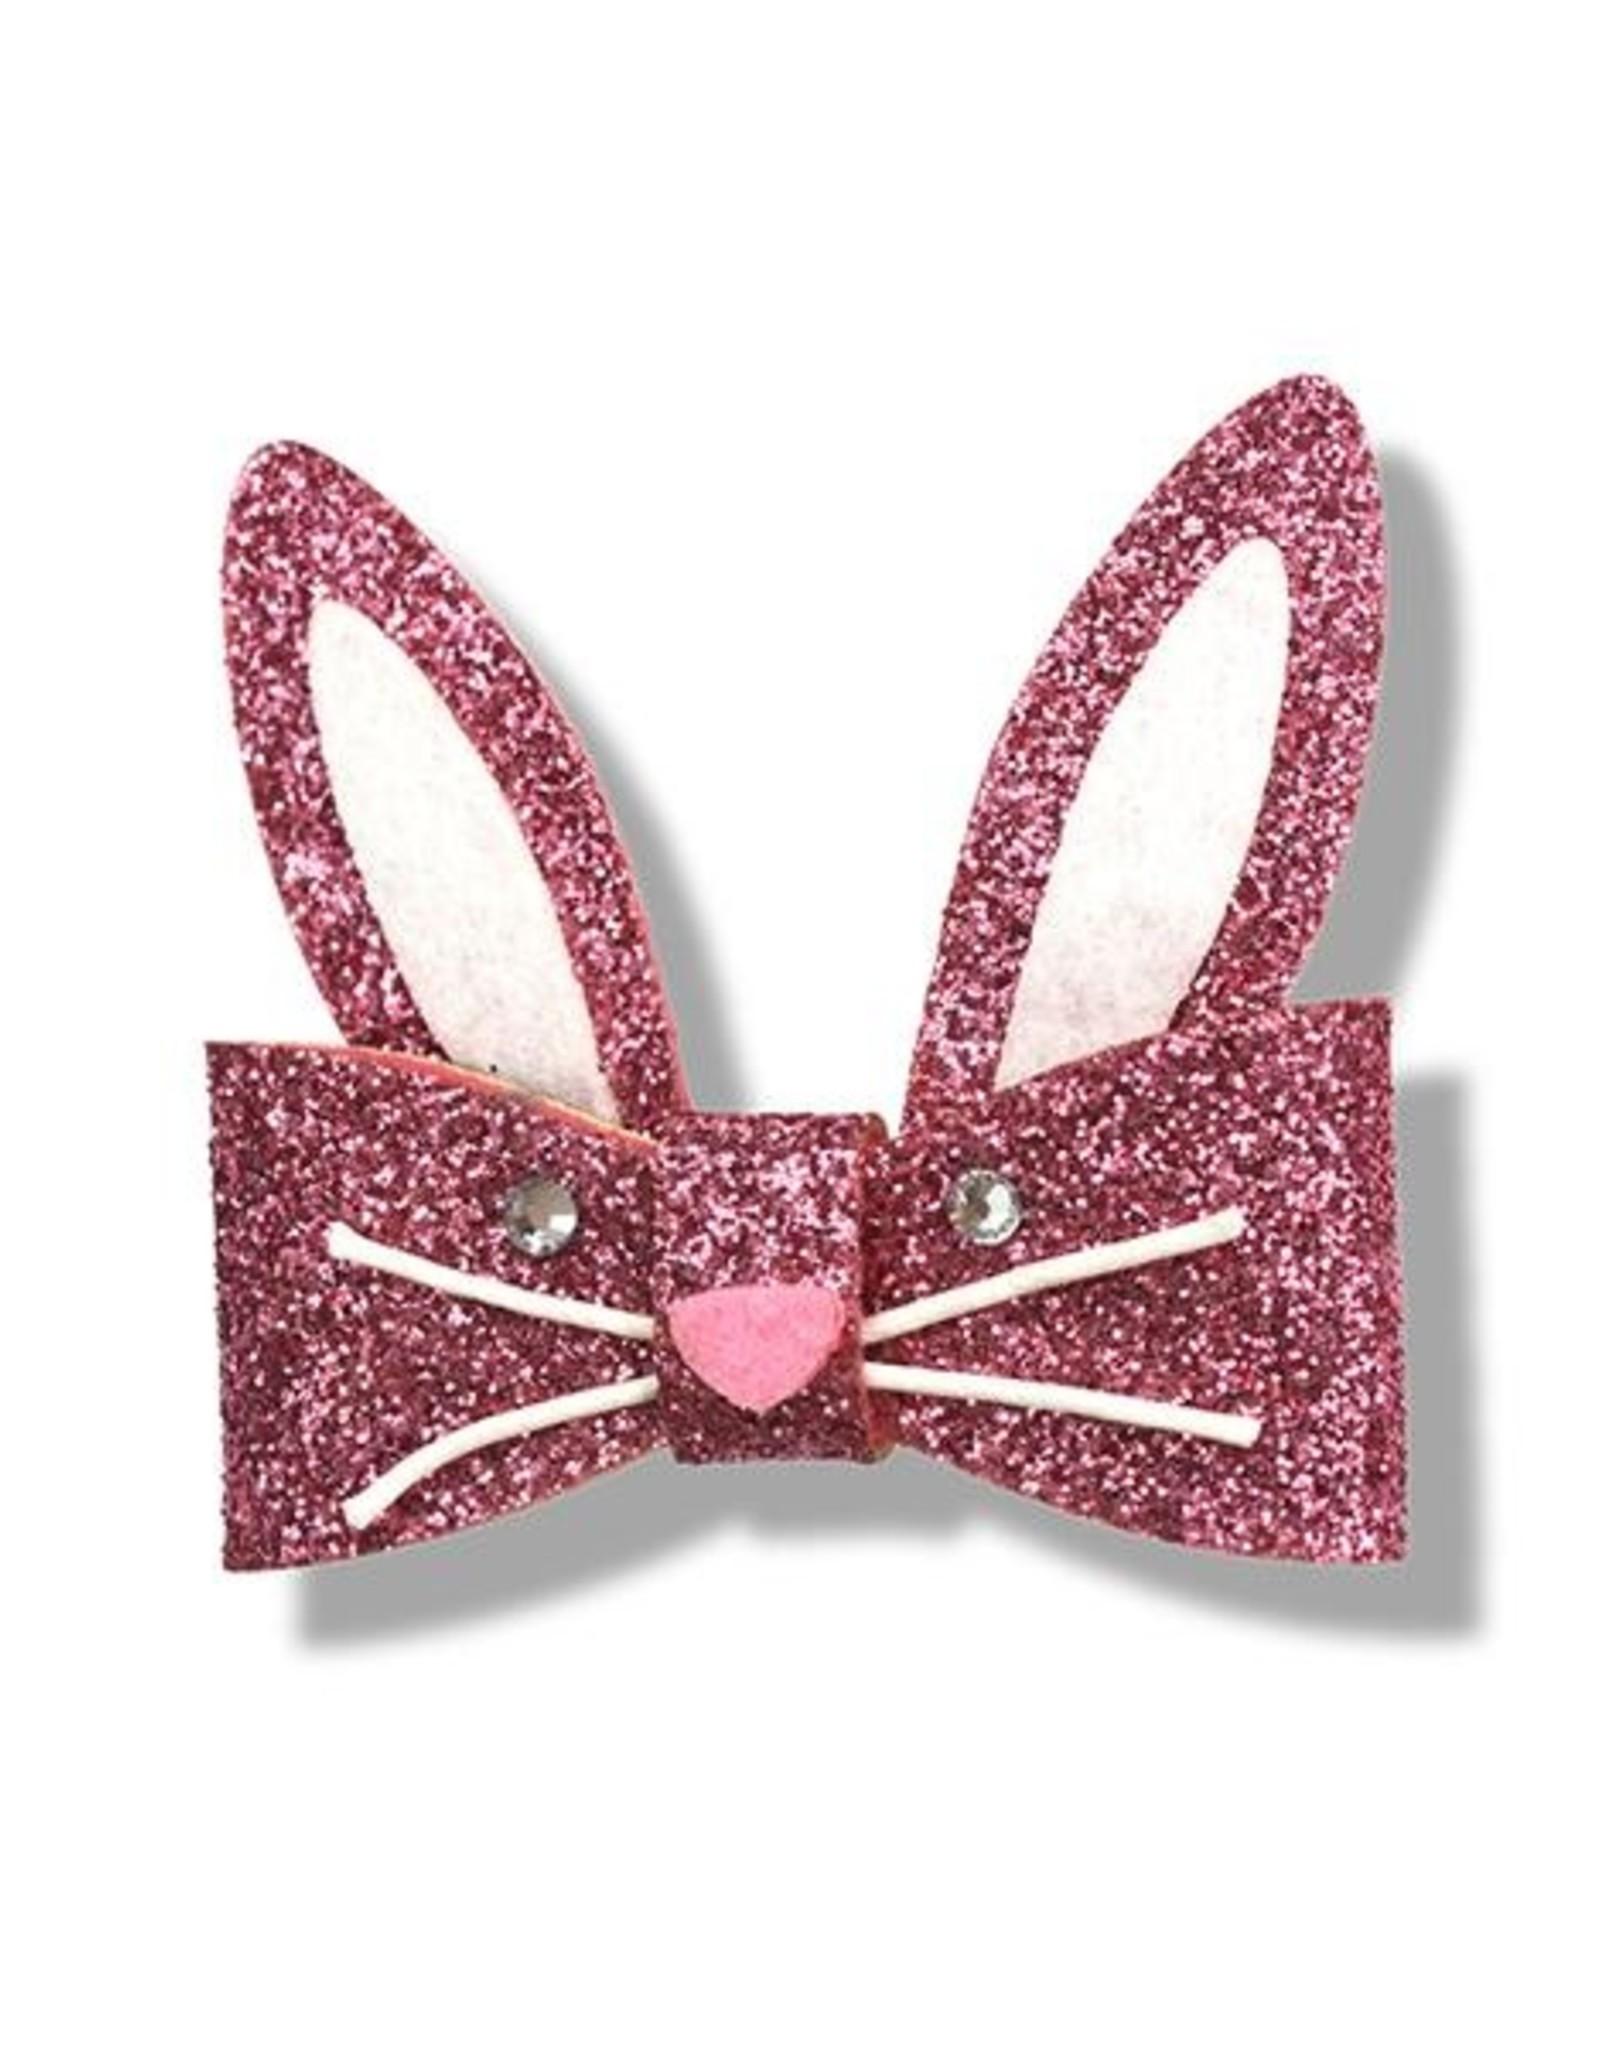 Minista Minista Pet Hair Clip - Bunny